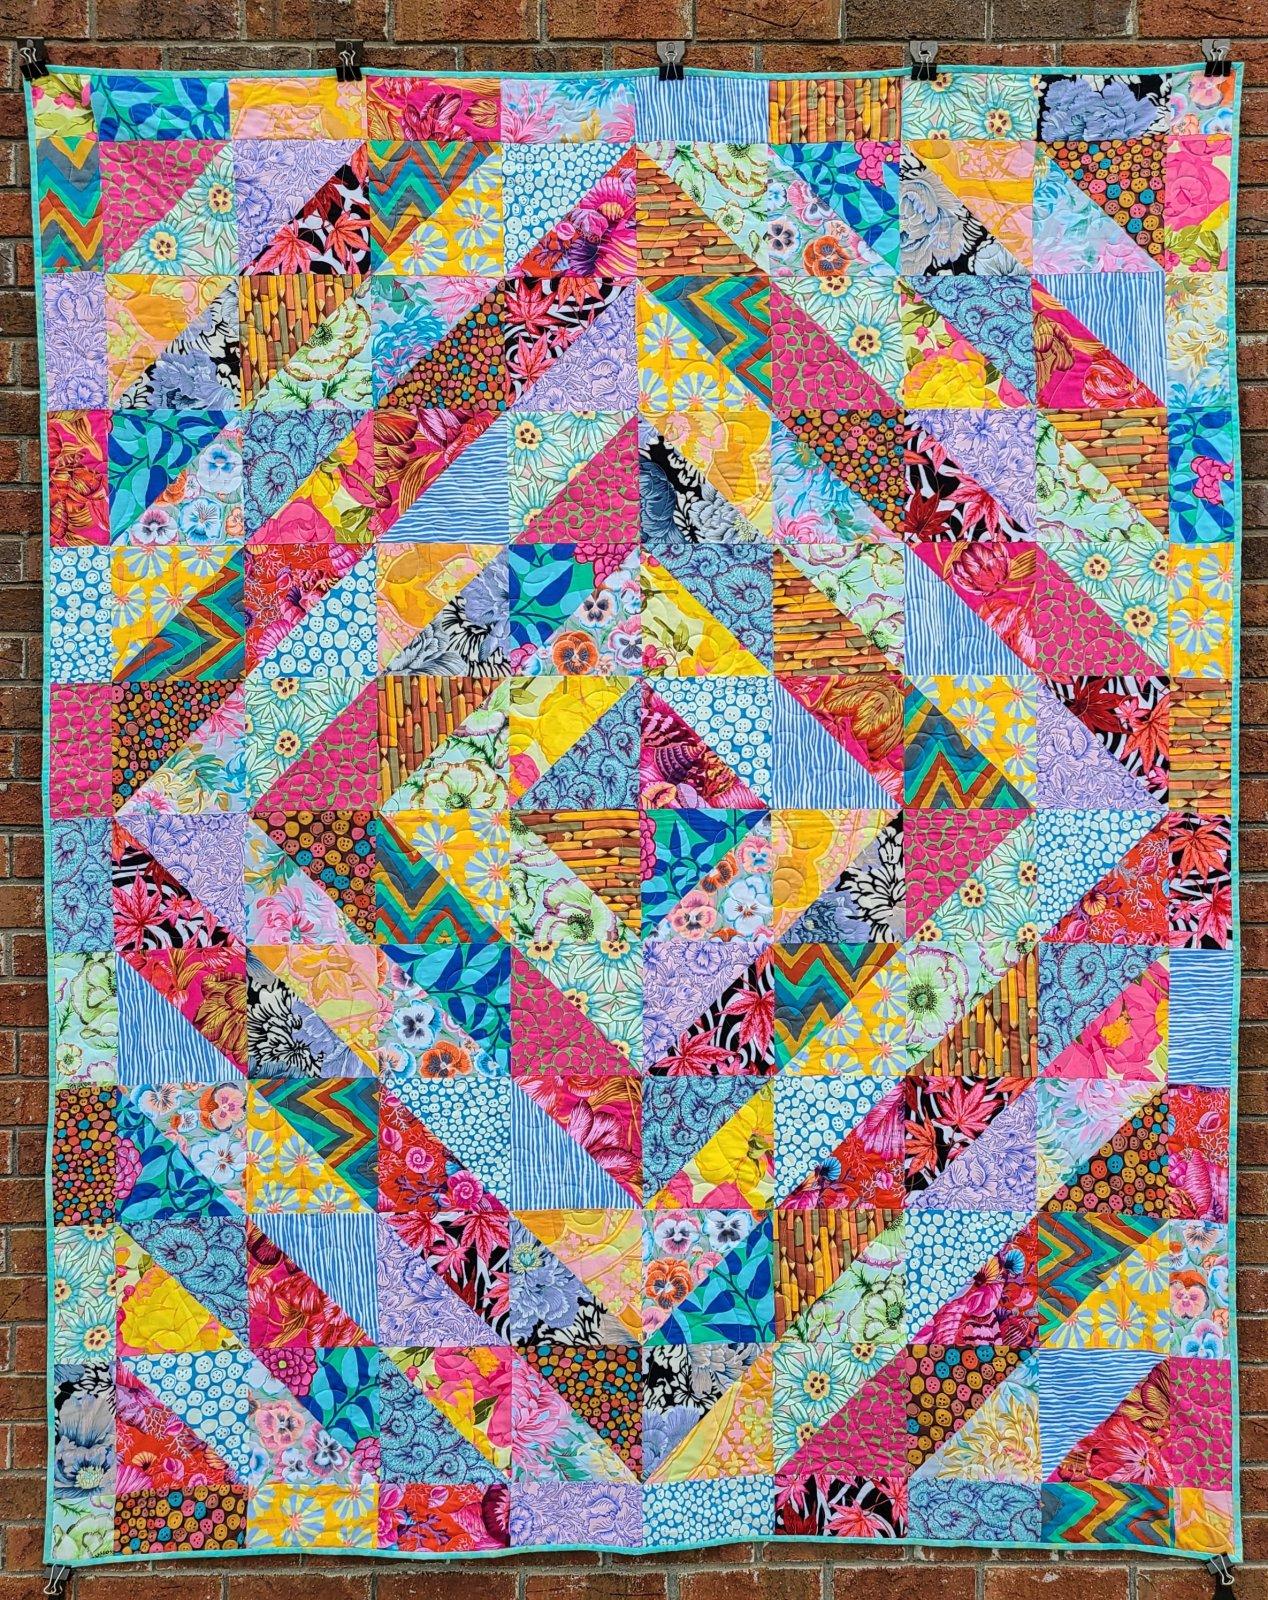 Drayton Hall Quilt Kit 63x77 - Multicolor featuring Kaffe Fassett fabrics